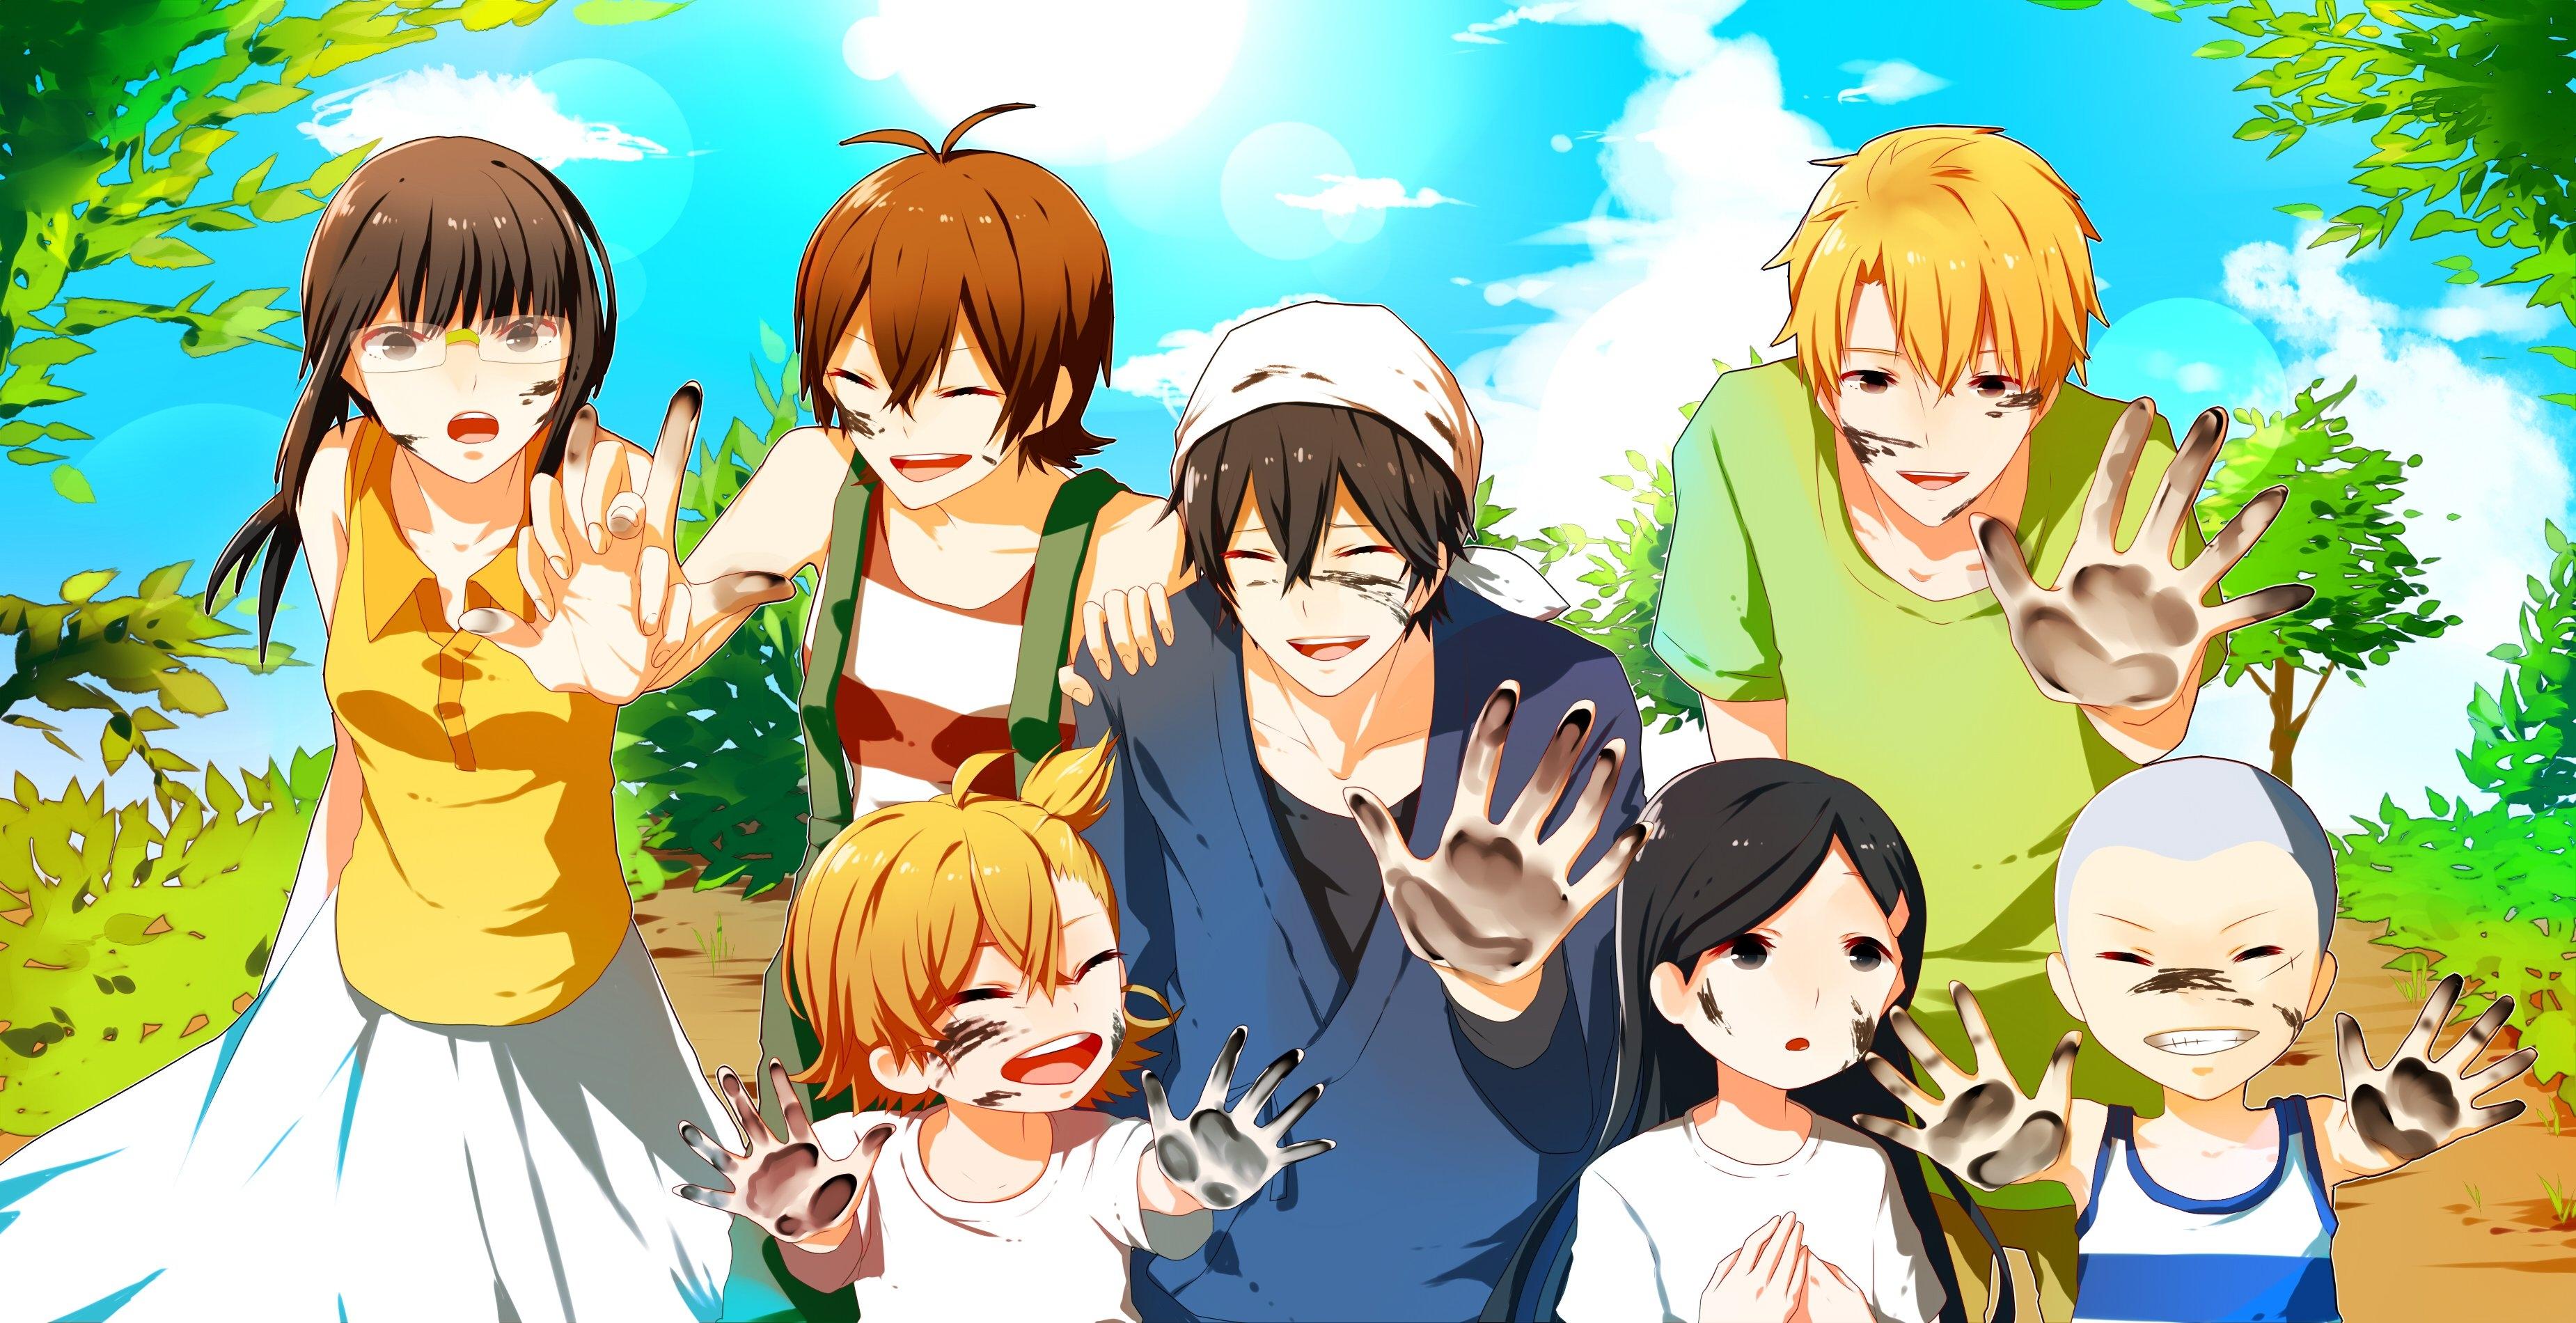 Top 6 Anime Characters : Barakamon papéis de parede hd planos fundo